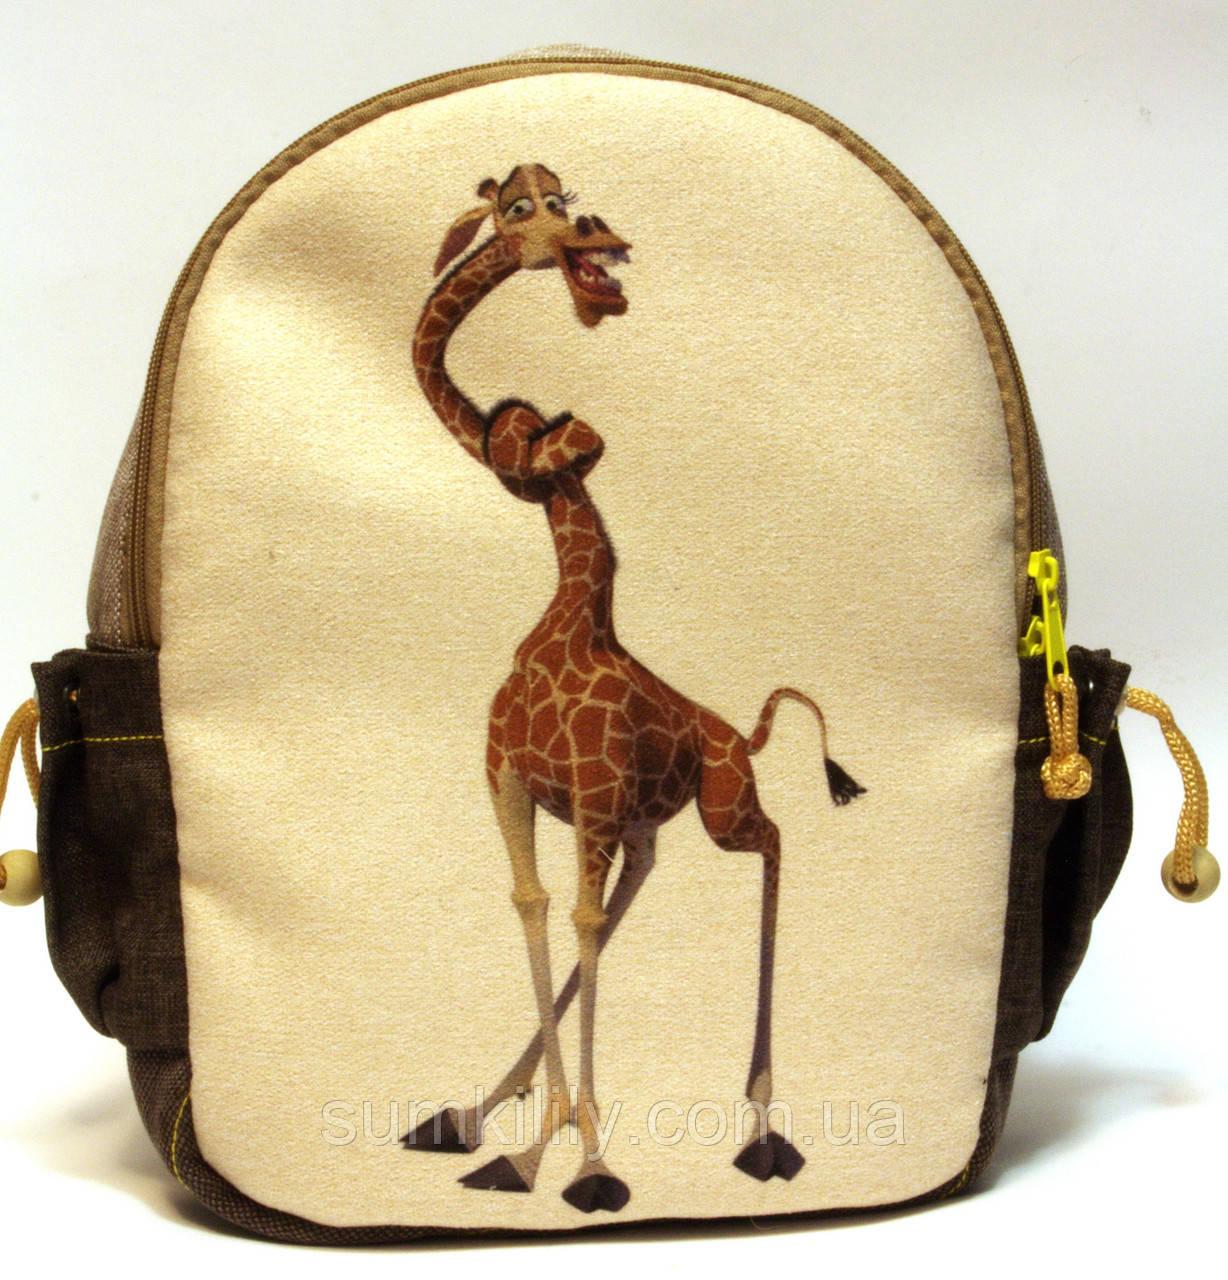 Детский рюкзак Мадагаскар Мелмэн